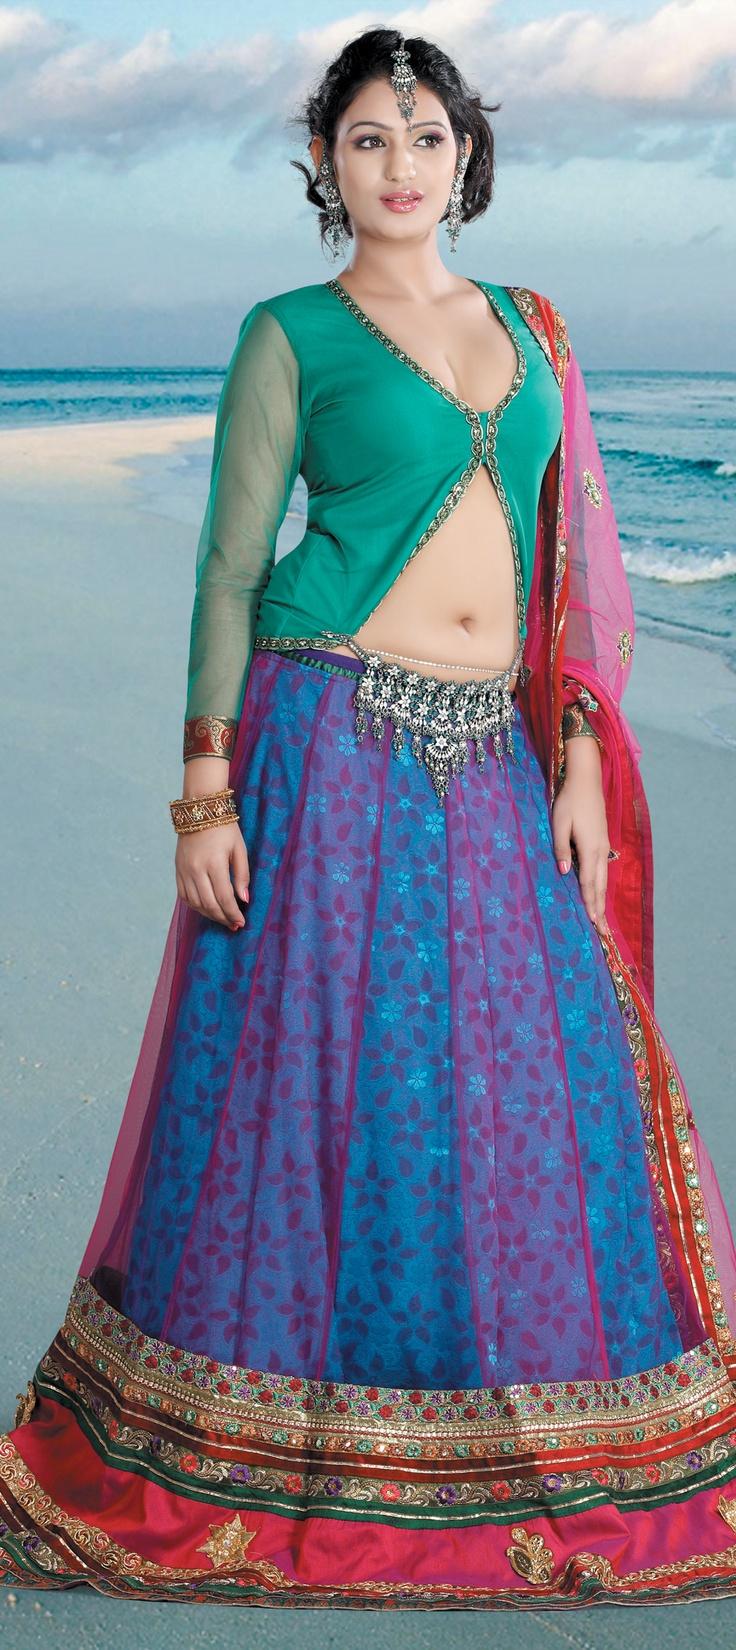 DISCOUNT AVAILABLE ....Indian wedding lehenga!!!!!Shop now @ http://www.indianweddingsaree.com/product/73873.html